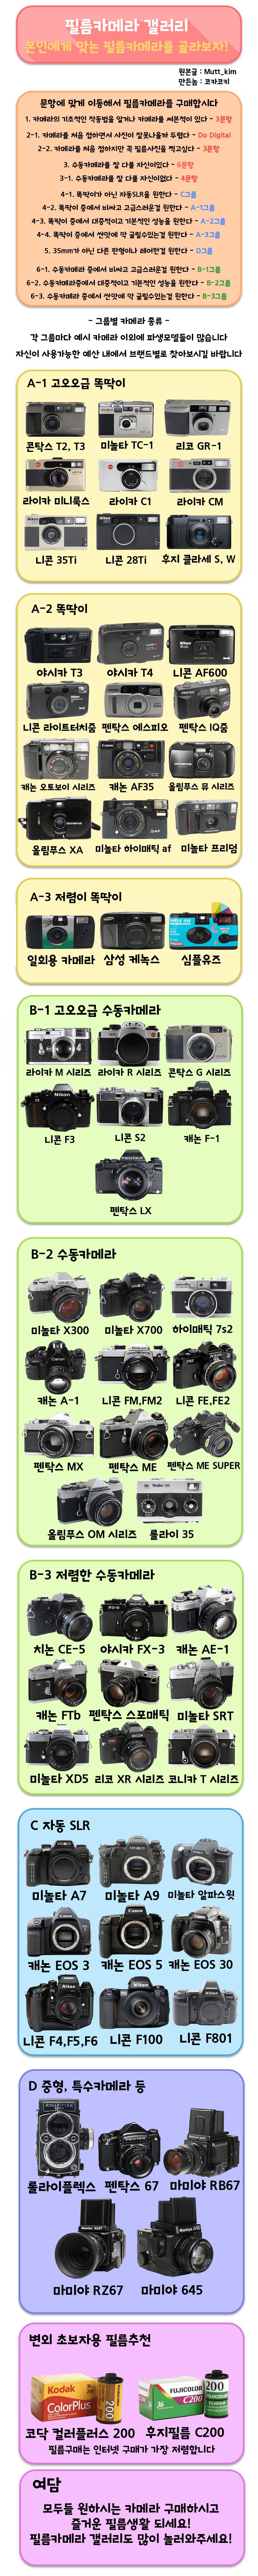 viewimage.php?id=2bb4dc2be6d335a37cbe&no=24b0d769e1d32ca73cec84fa11d028316f6e59db3d00f81430124c7066e7965cba122ad2fb67faf02feb2c53fc2c4d6586add007a2328535a9c9d69b1f731192b63beee54ae516896e6959eb6181cfff149ef5f445bb80f86d925dc0c3198703d4e4dac9e5